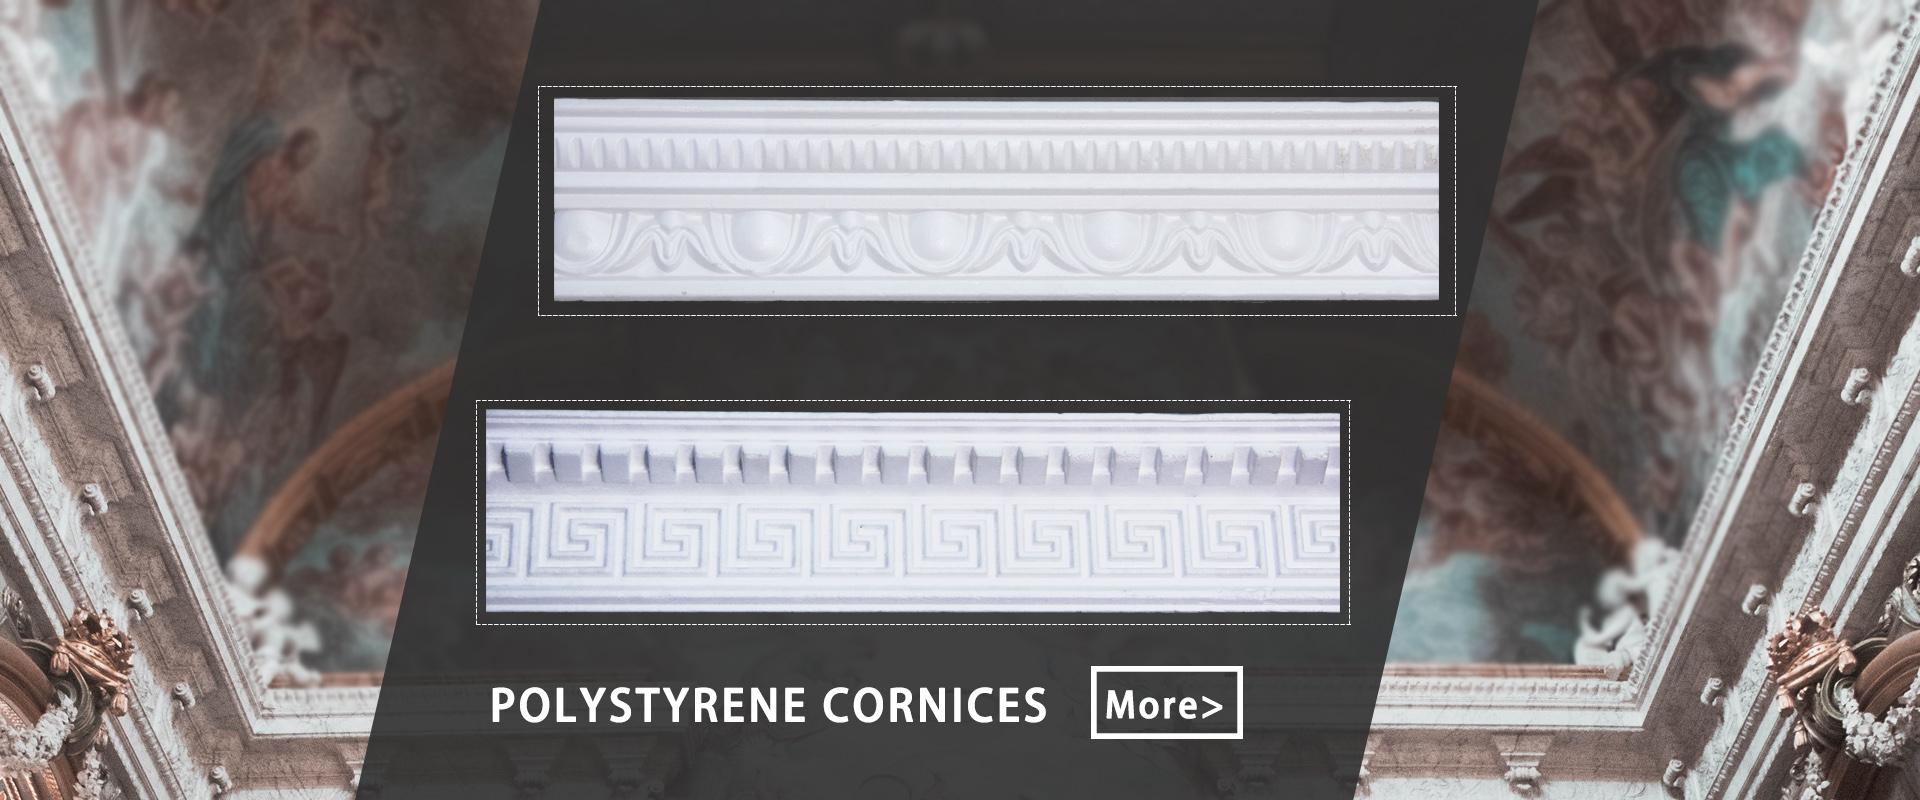 Cornice Banner